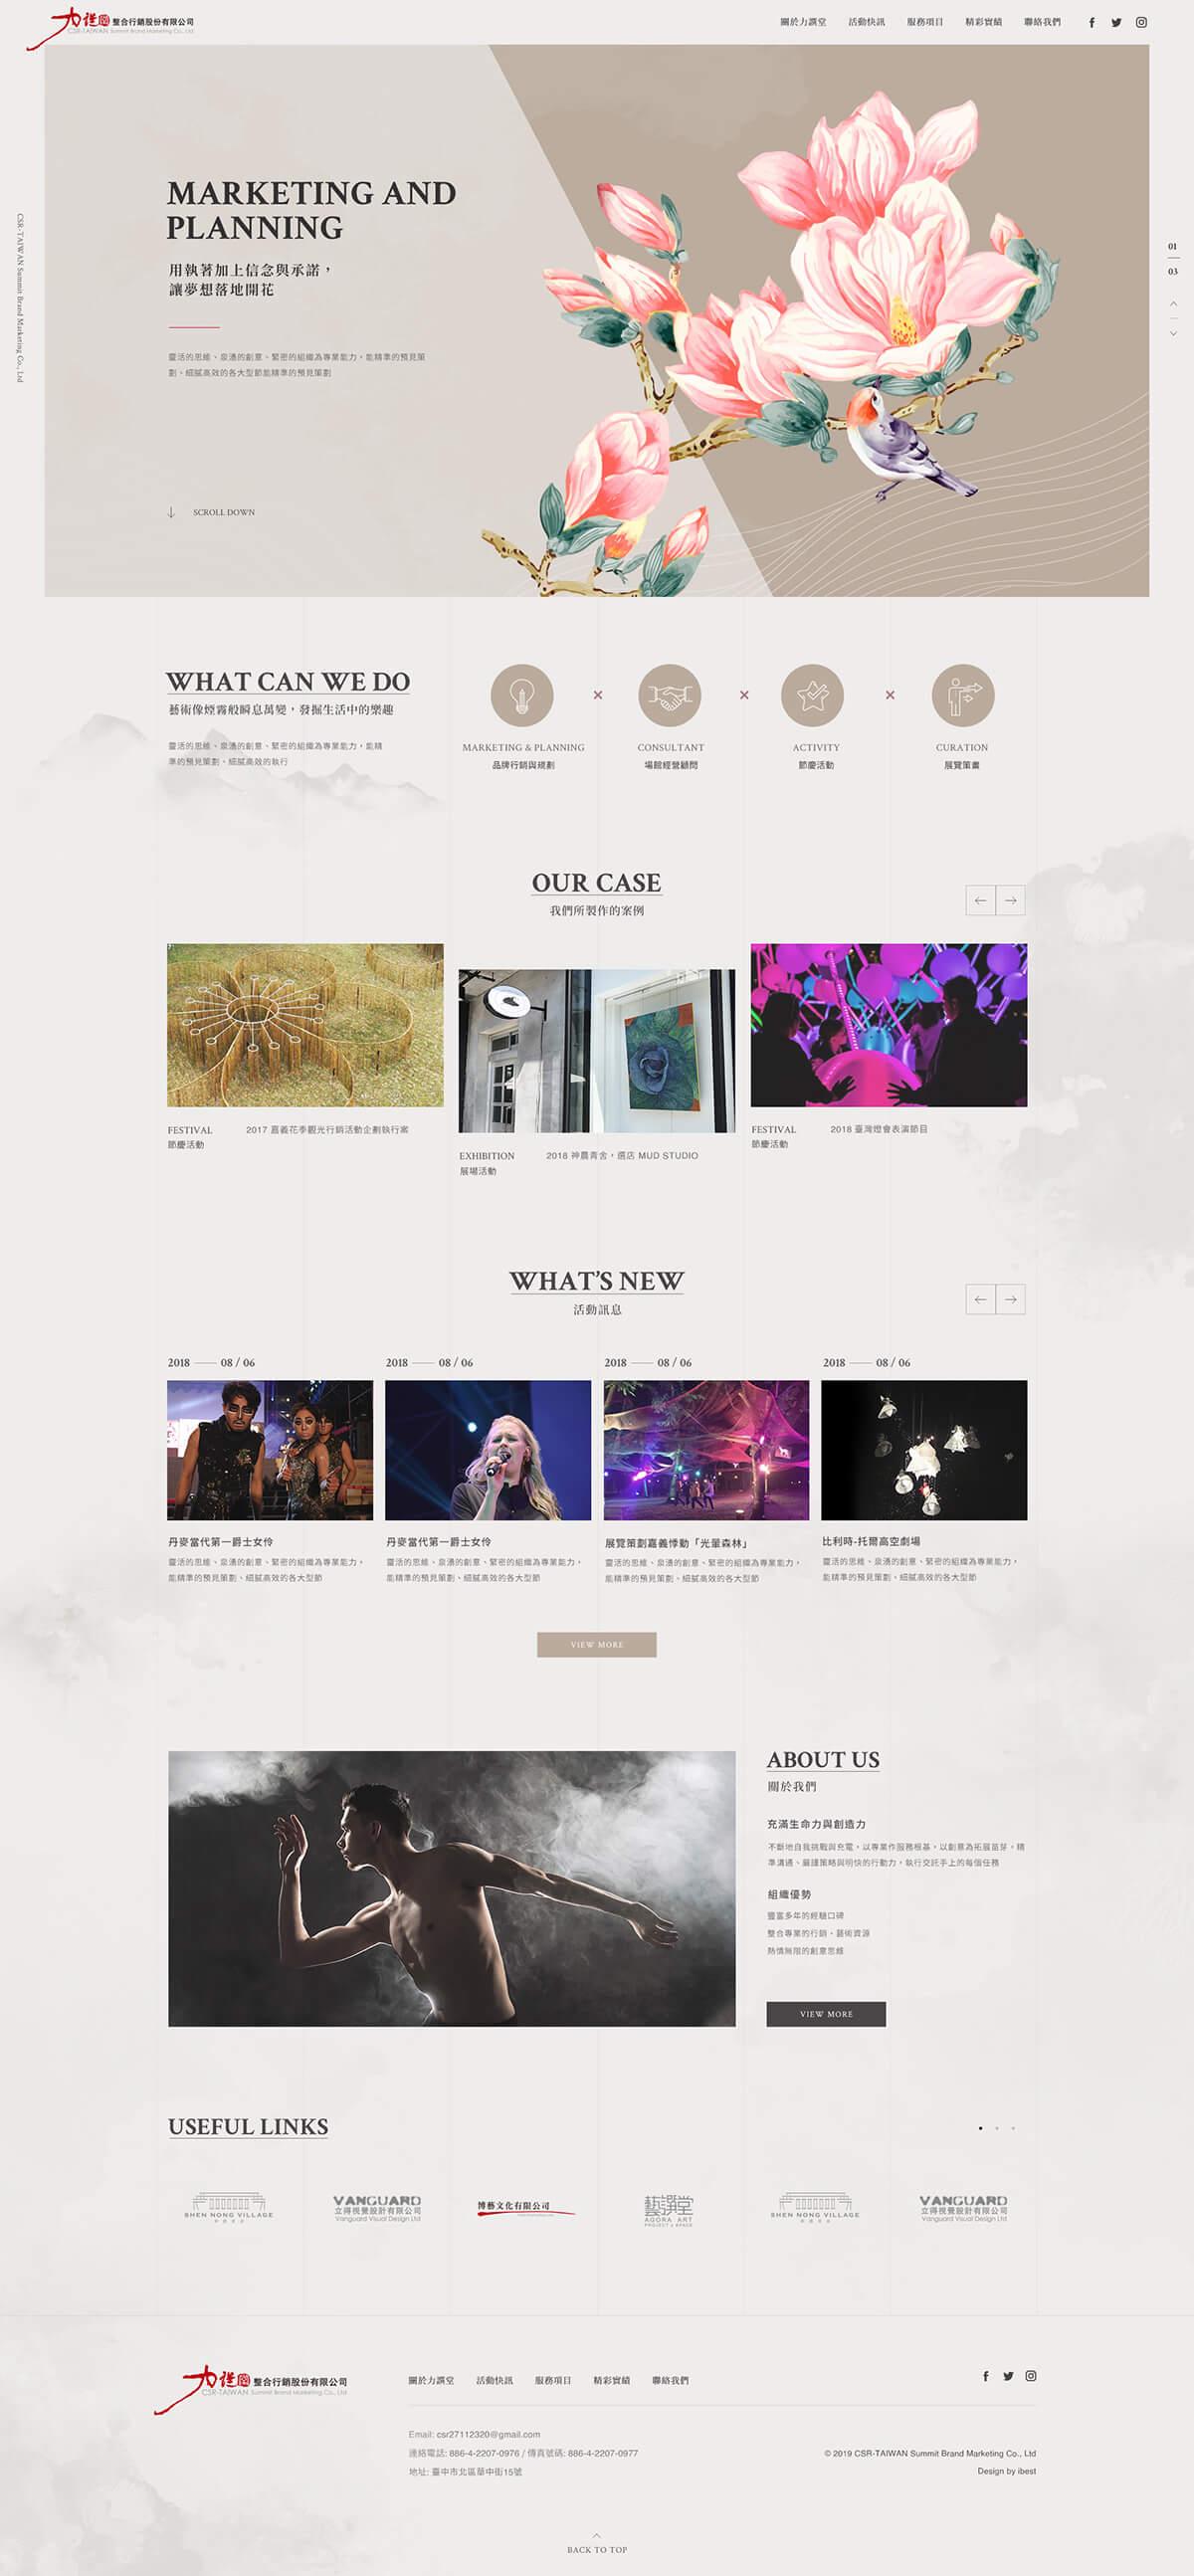 力譔堂-網頁設計